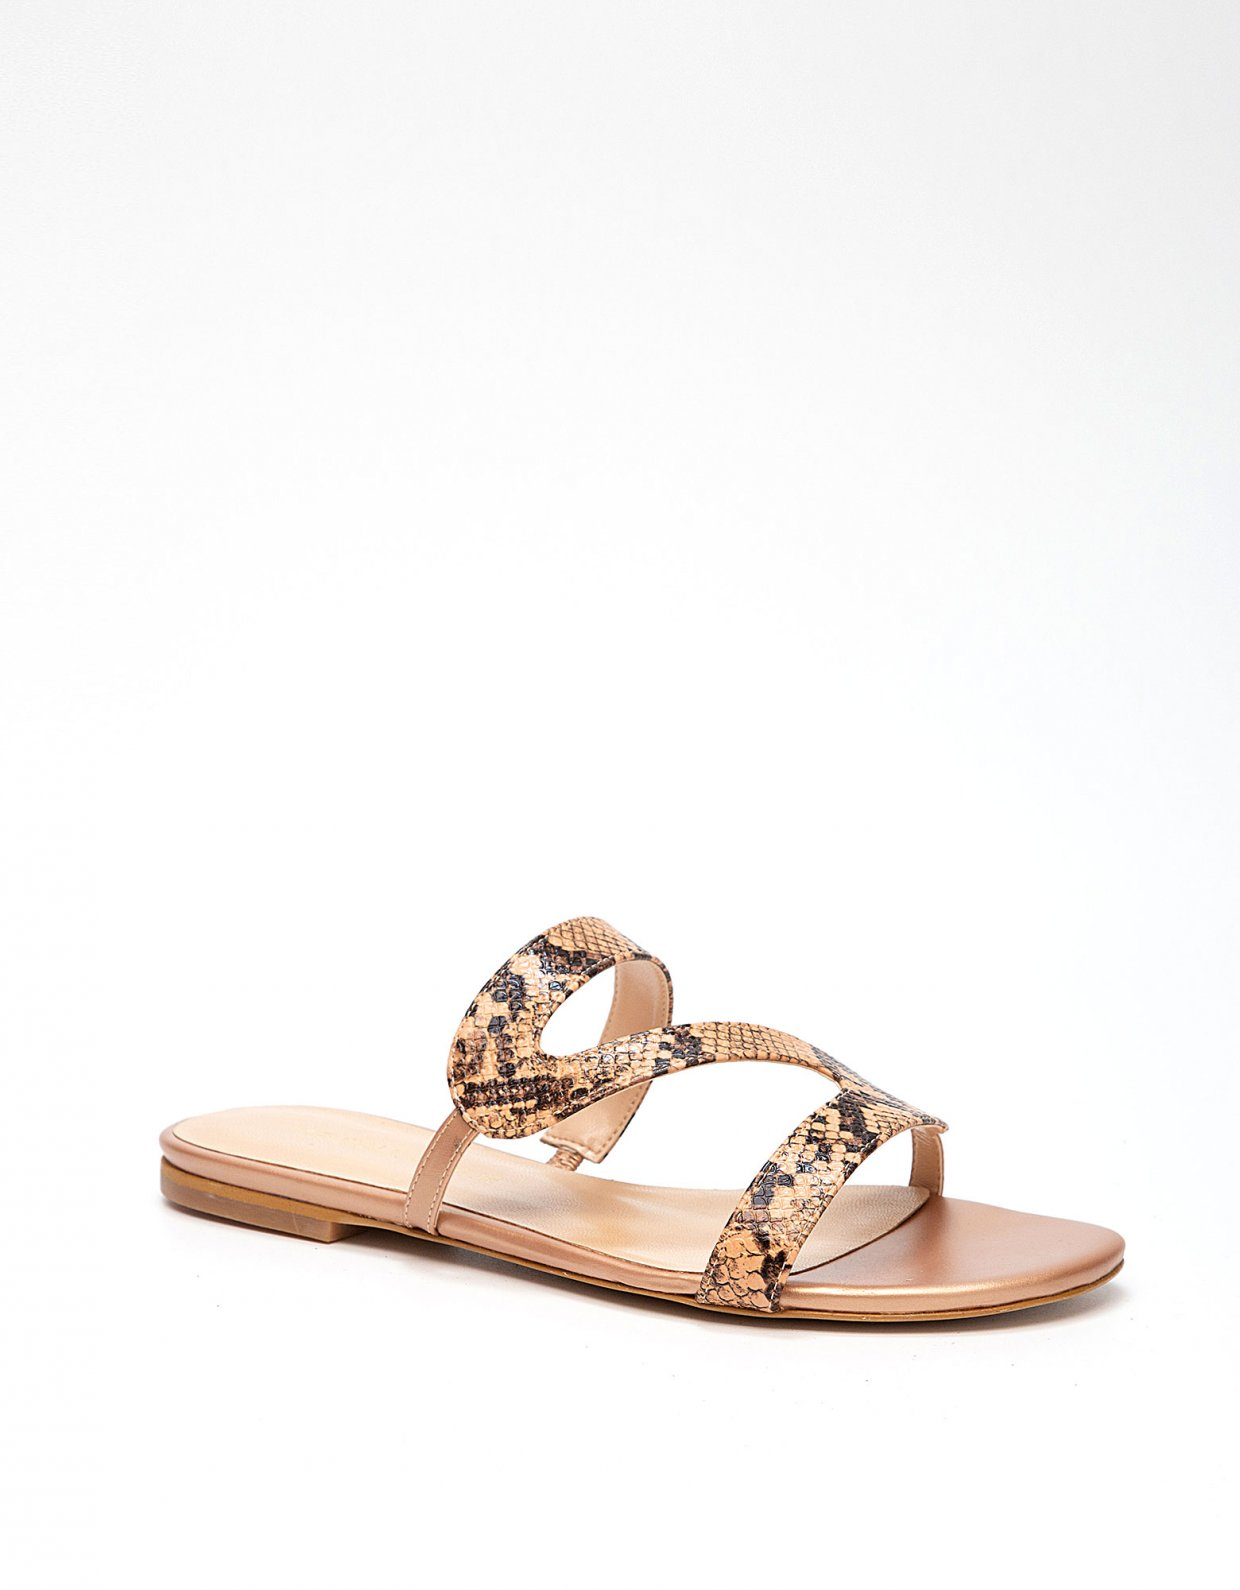 Kendall + Kylie Bahama snake nude sandals